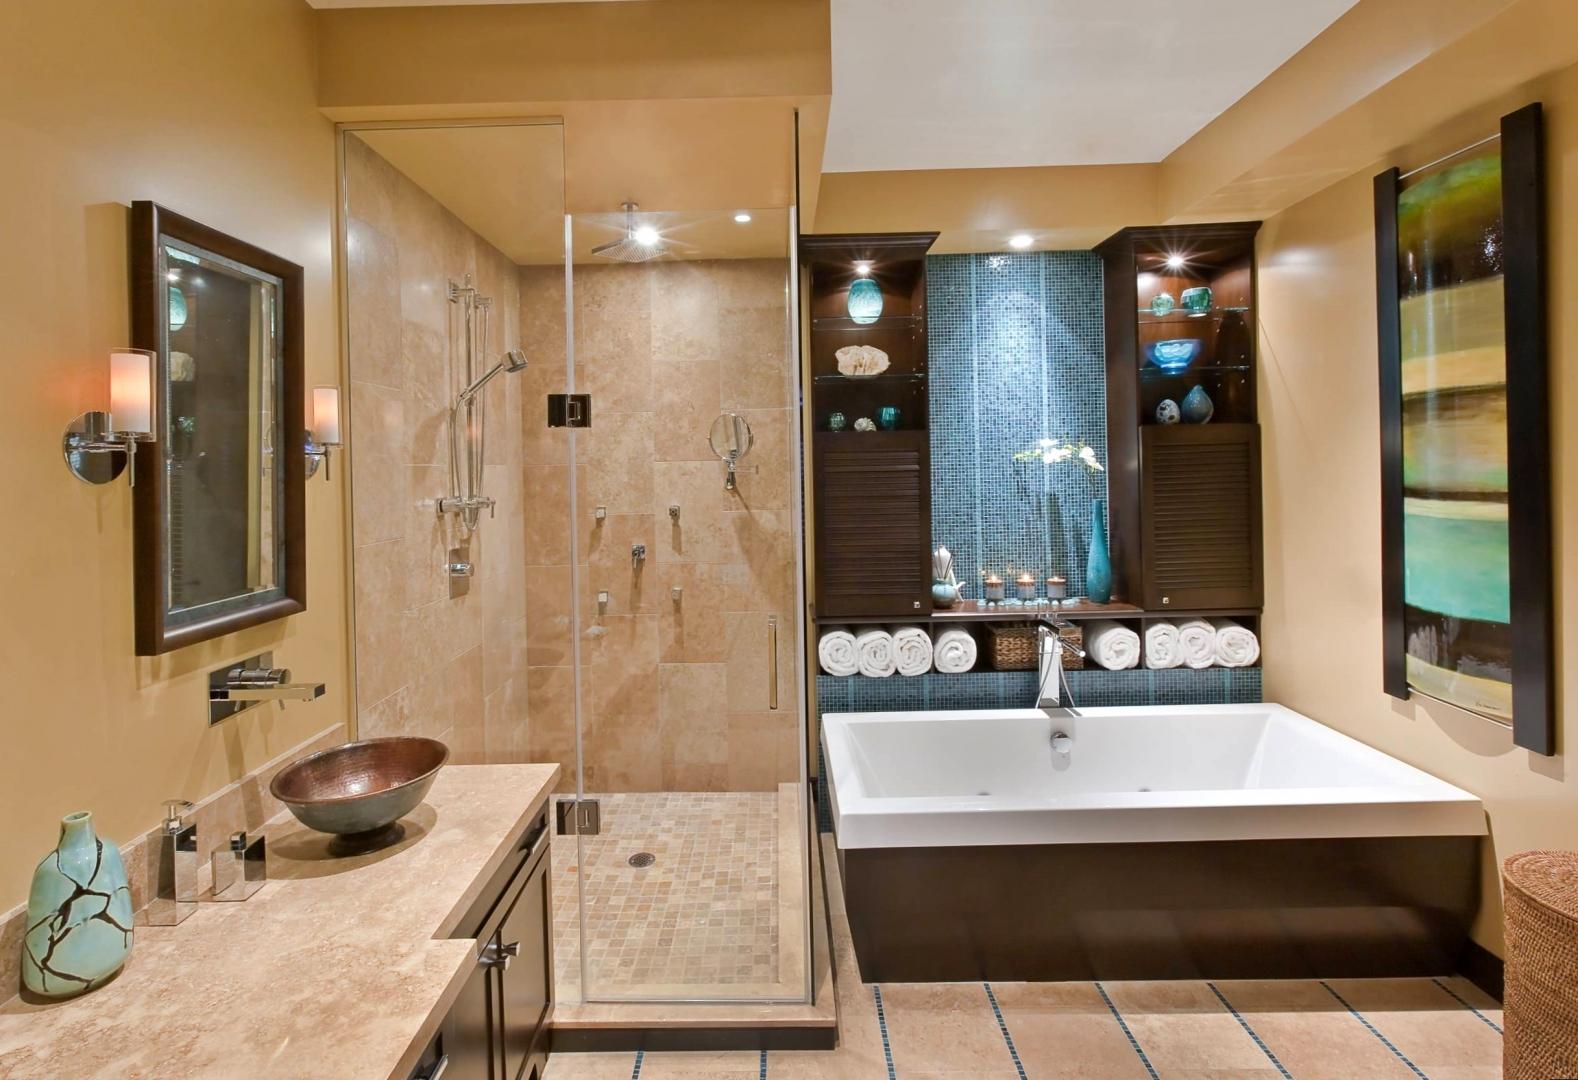 Ванна и душевая в комнате 9 кв м